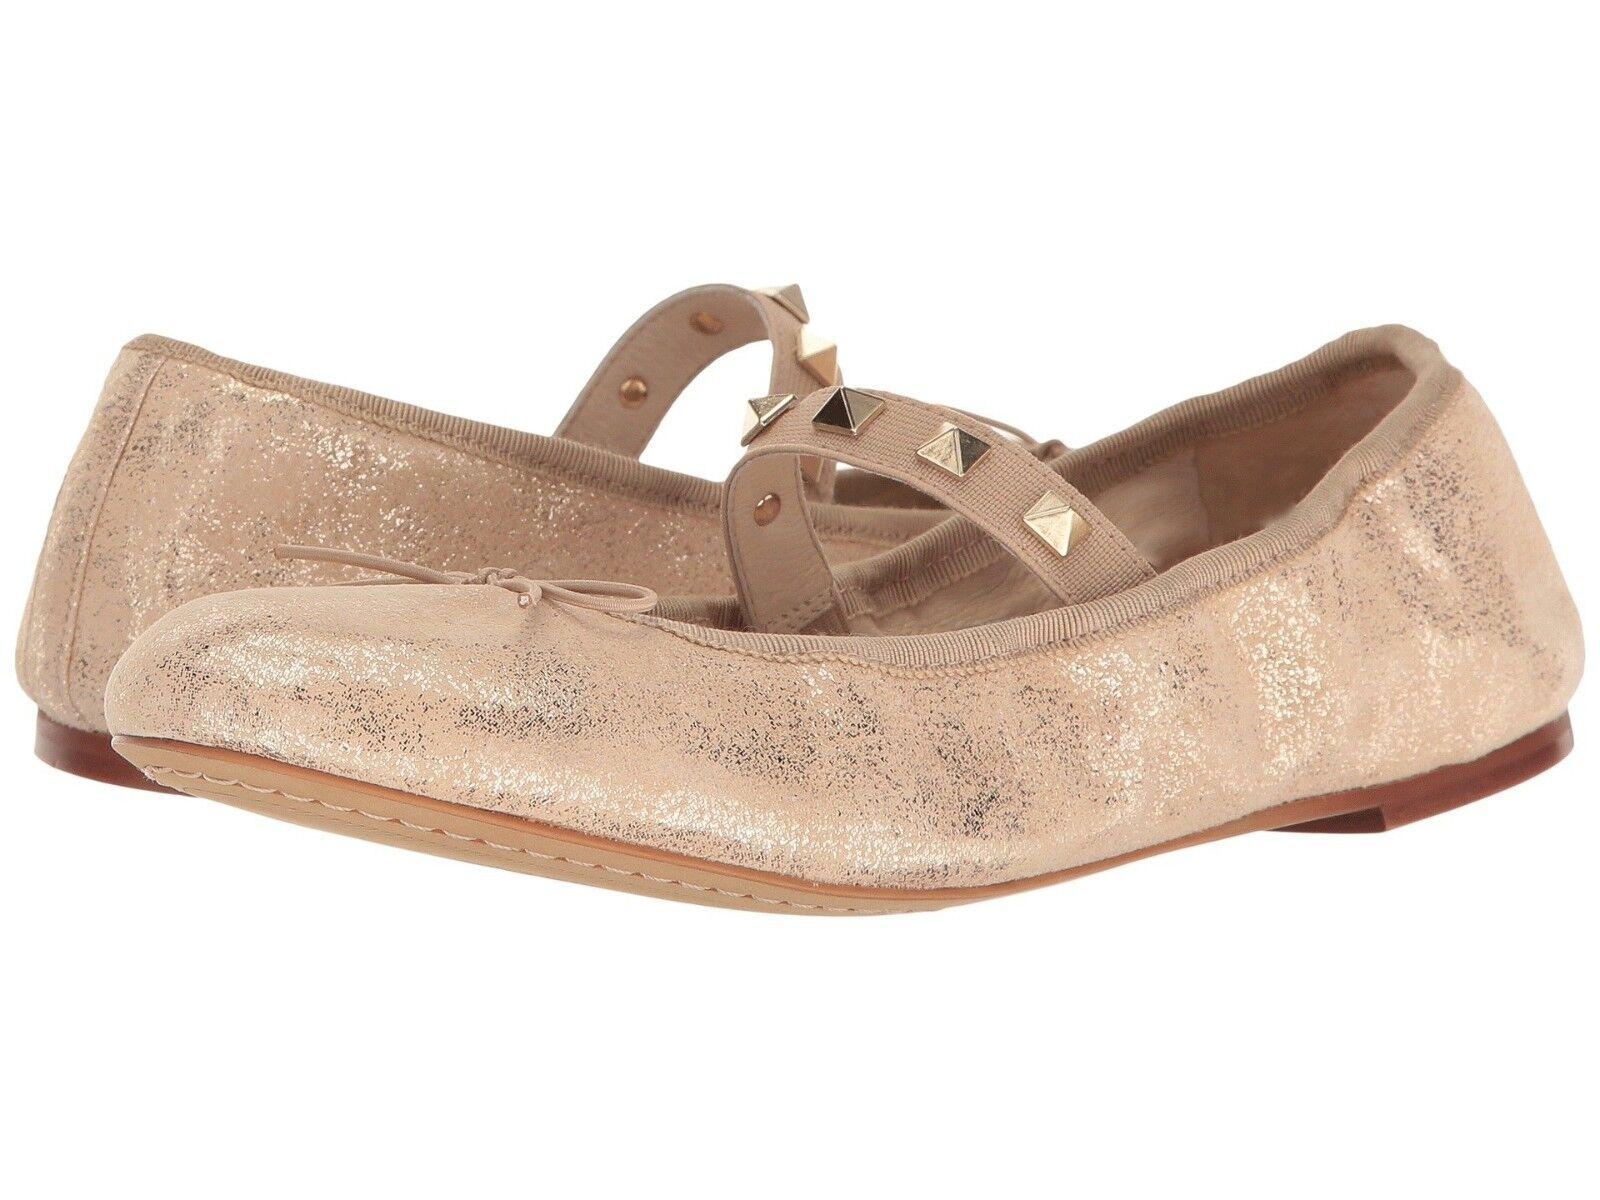 Vince Camuto Prilla Metallic Studded Ballet Flats, Größes 6-9 Metal Beige